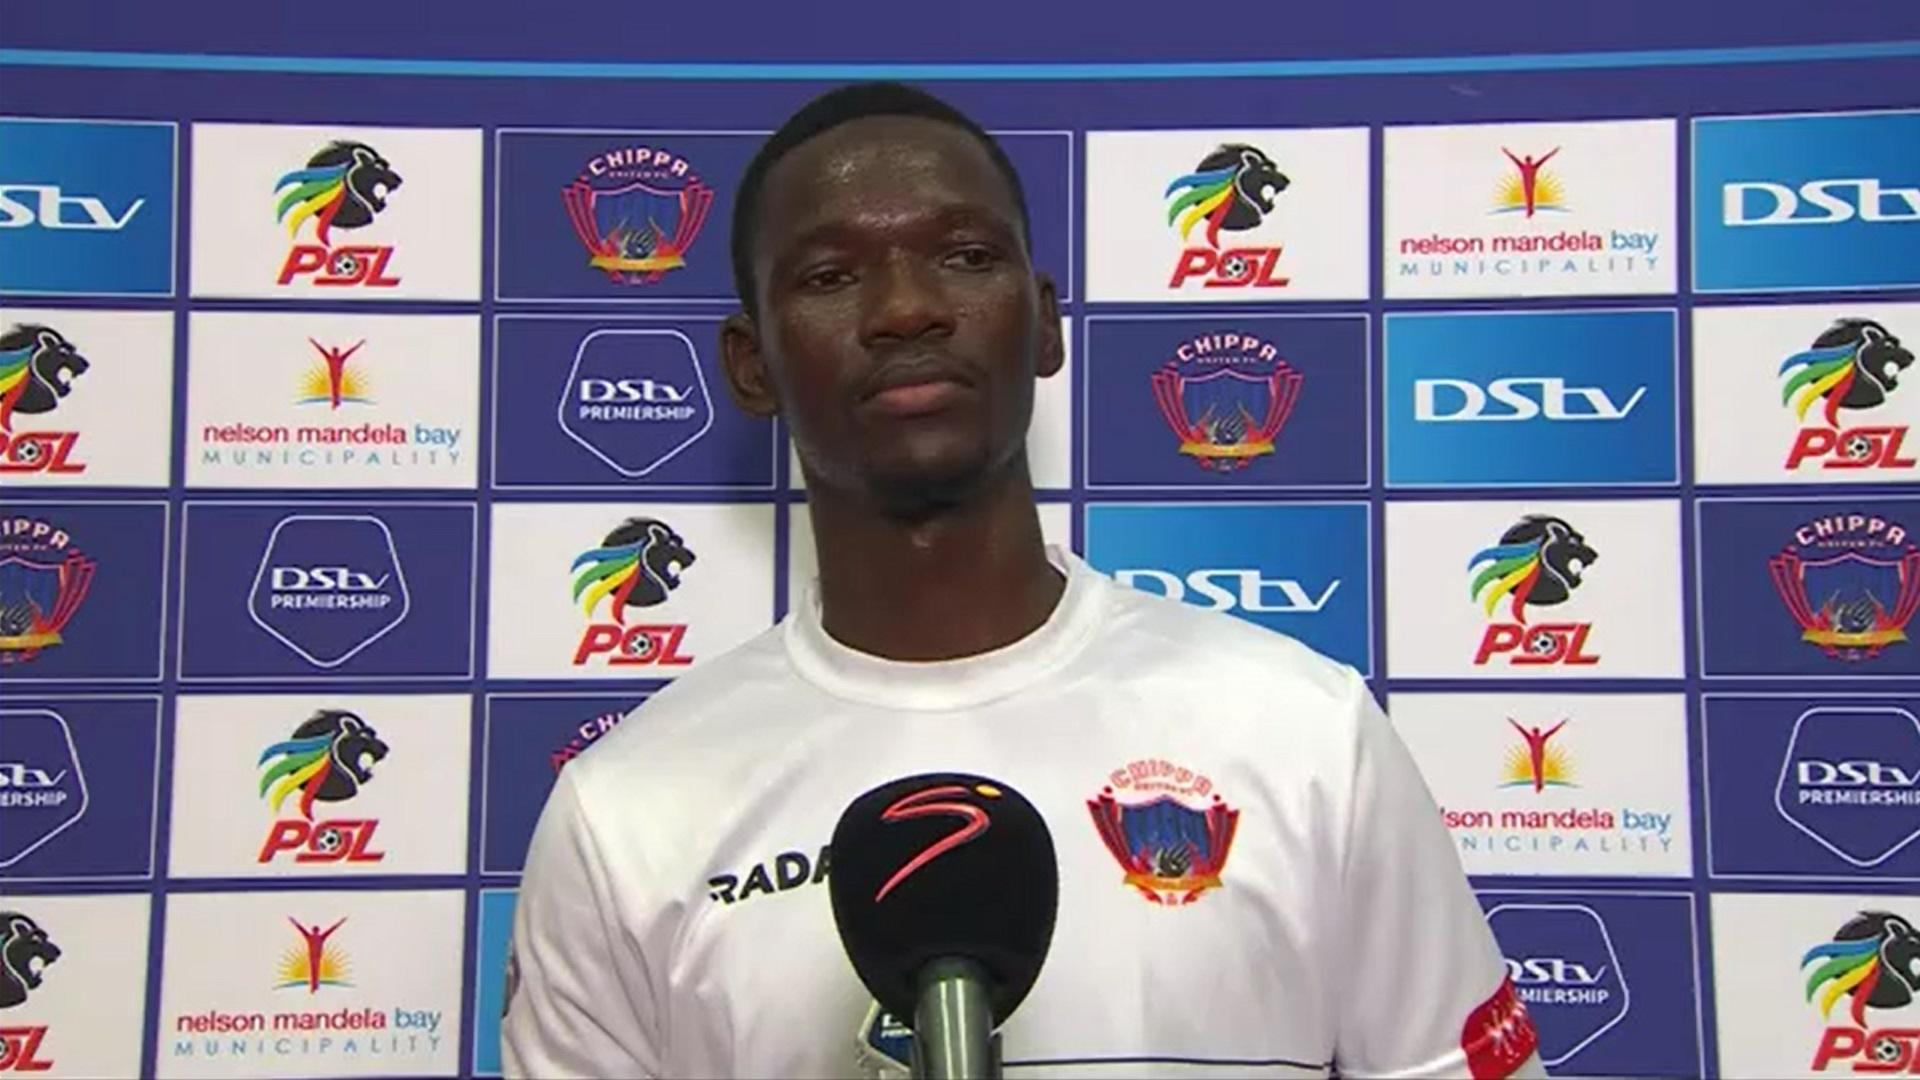 DStv Premiership | Chippa United v Mamelodi Sundowns | Post-match interview with Veluyeke Zulu